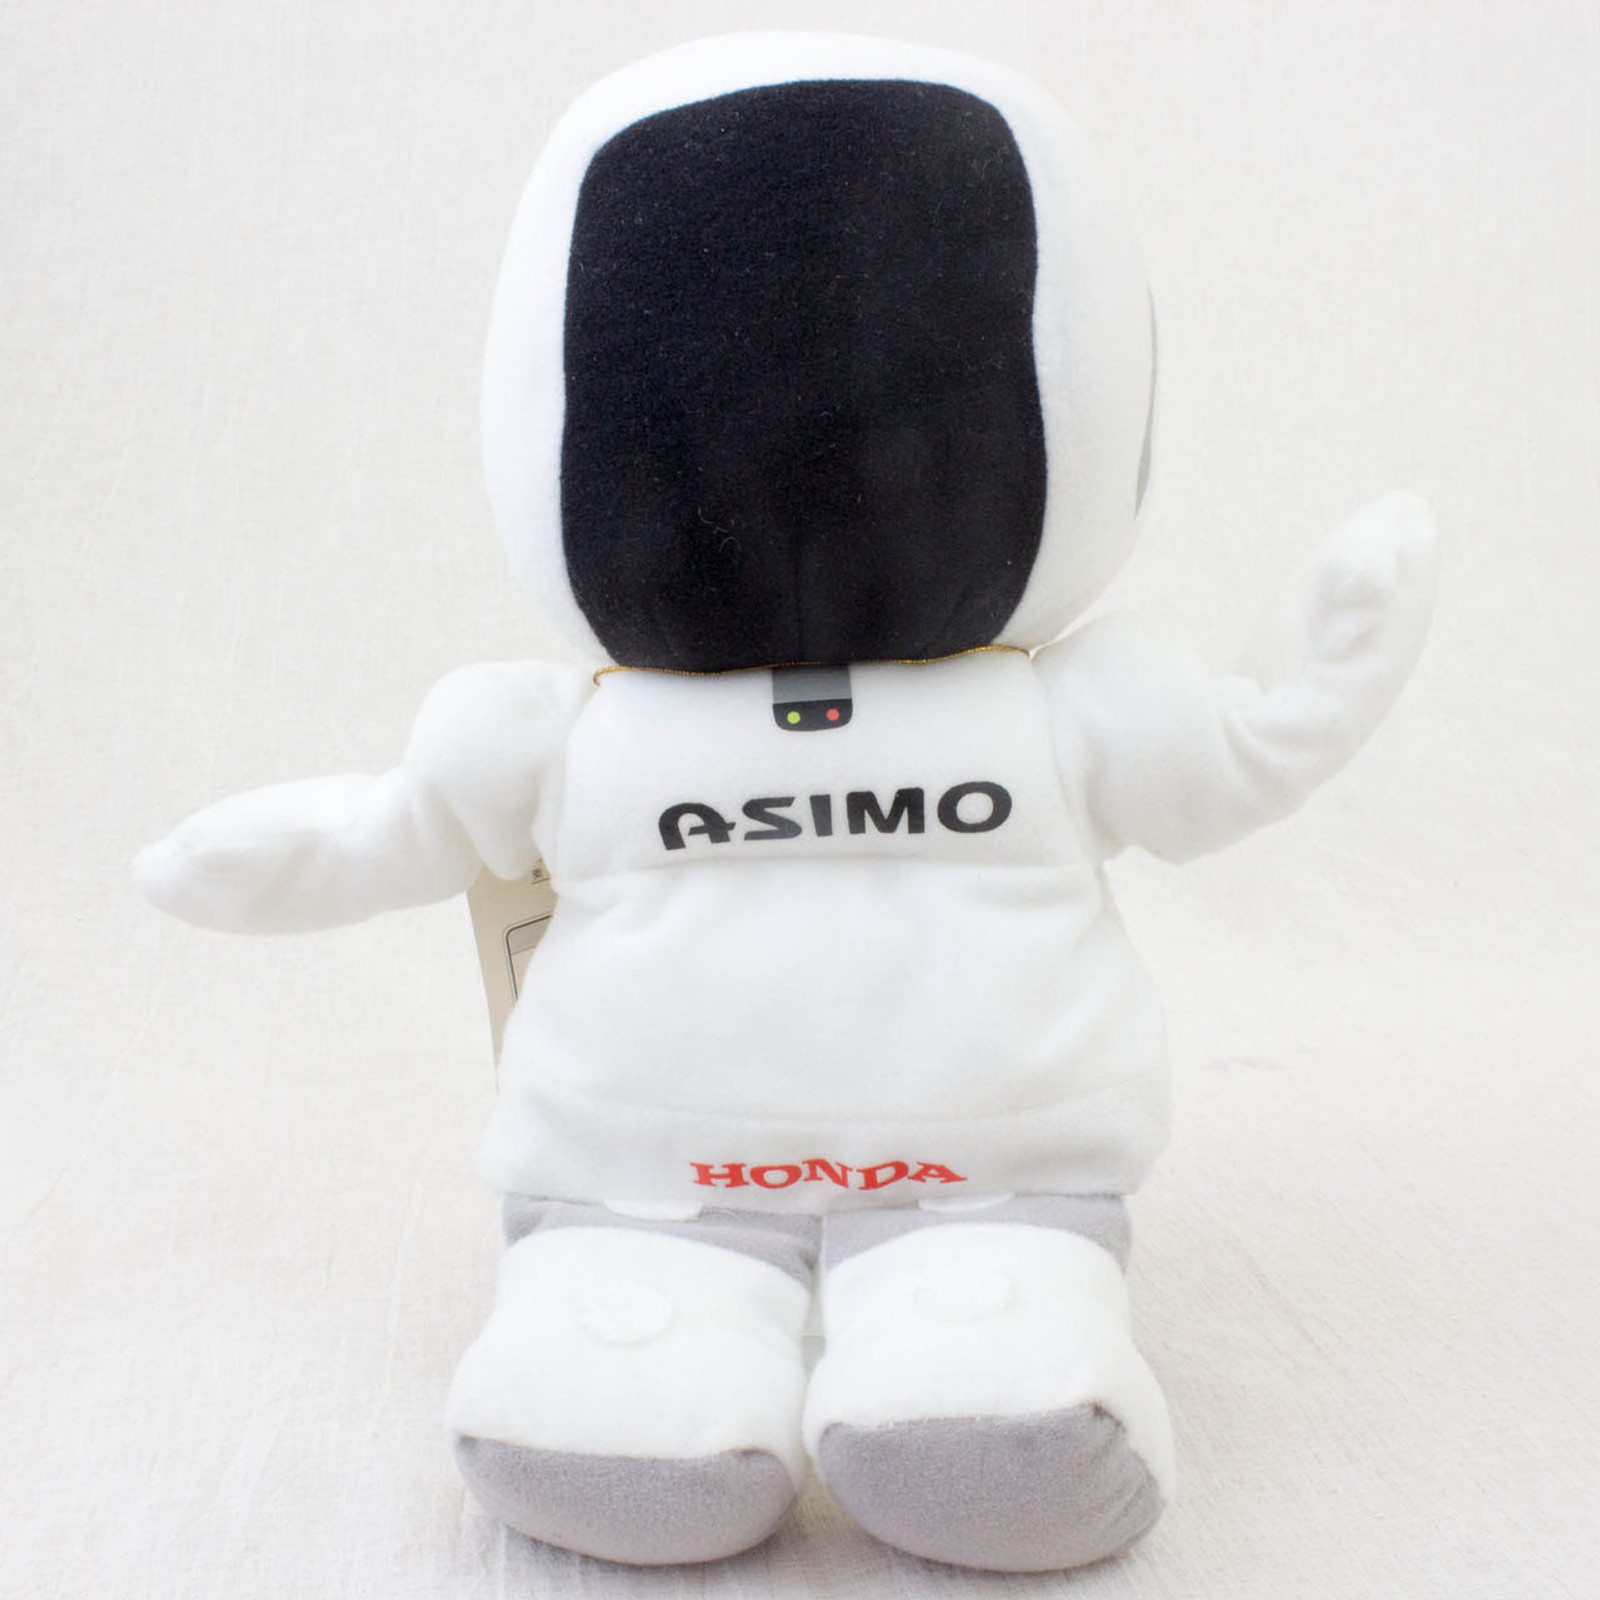 "HONDA Humanoid Robot Asimo Plush Doll Hand Puppet Figure 9"" JAPAN"